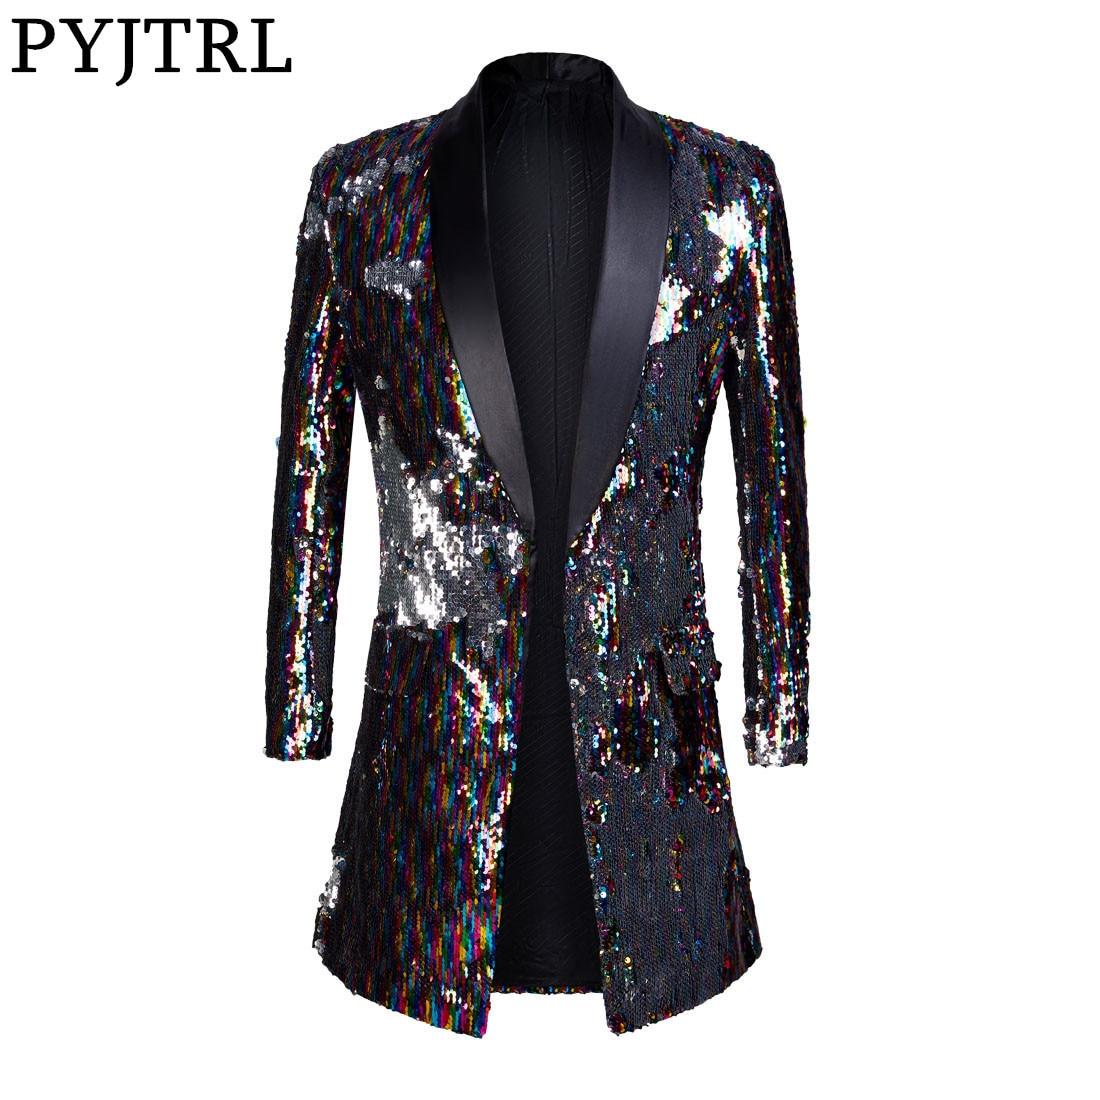 PYJTRL זכר אופנה צעיף דש דו צדדי צבעוני פאייטים ארוך חליפות מעיל בלייזר Masculino Slim Fit גברים DJ זינגר תלבושות